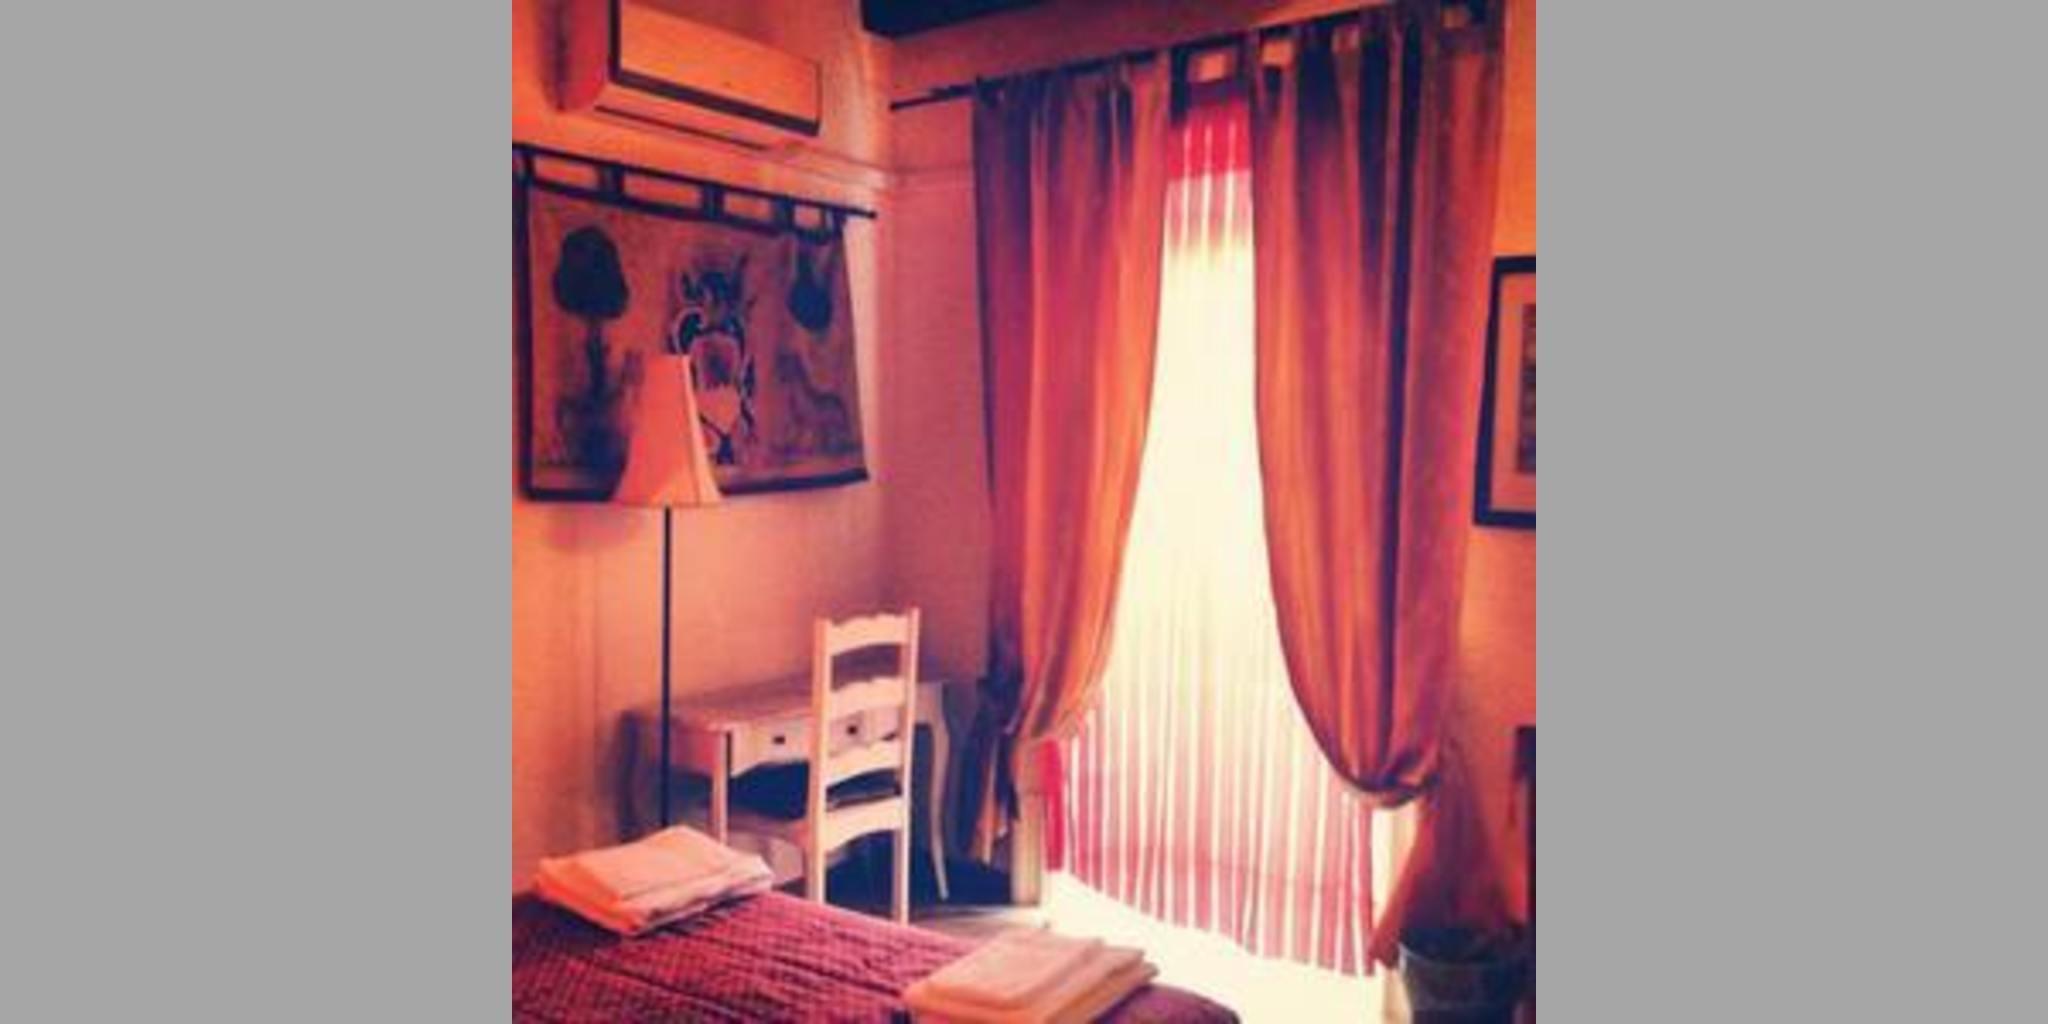 Bed & Breakfast Palermo - B&B Centro Storico Palermo